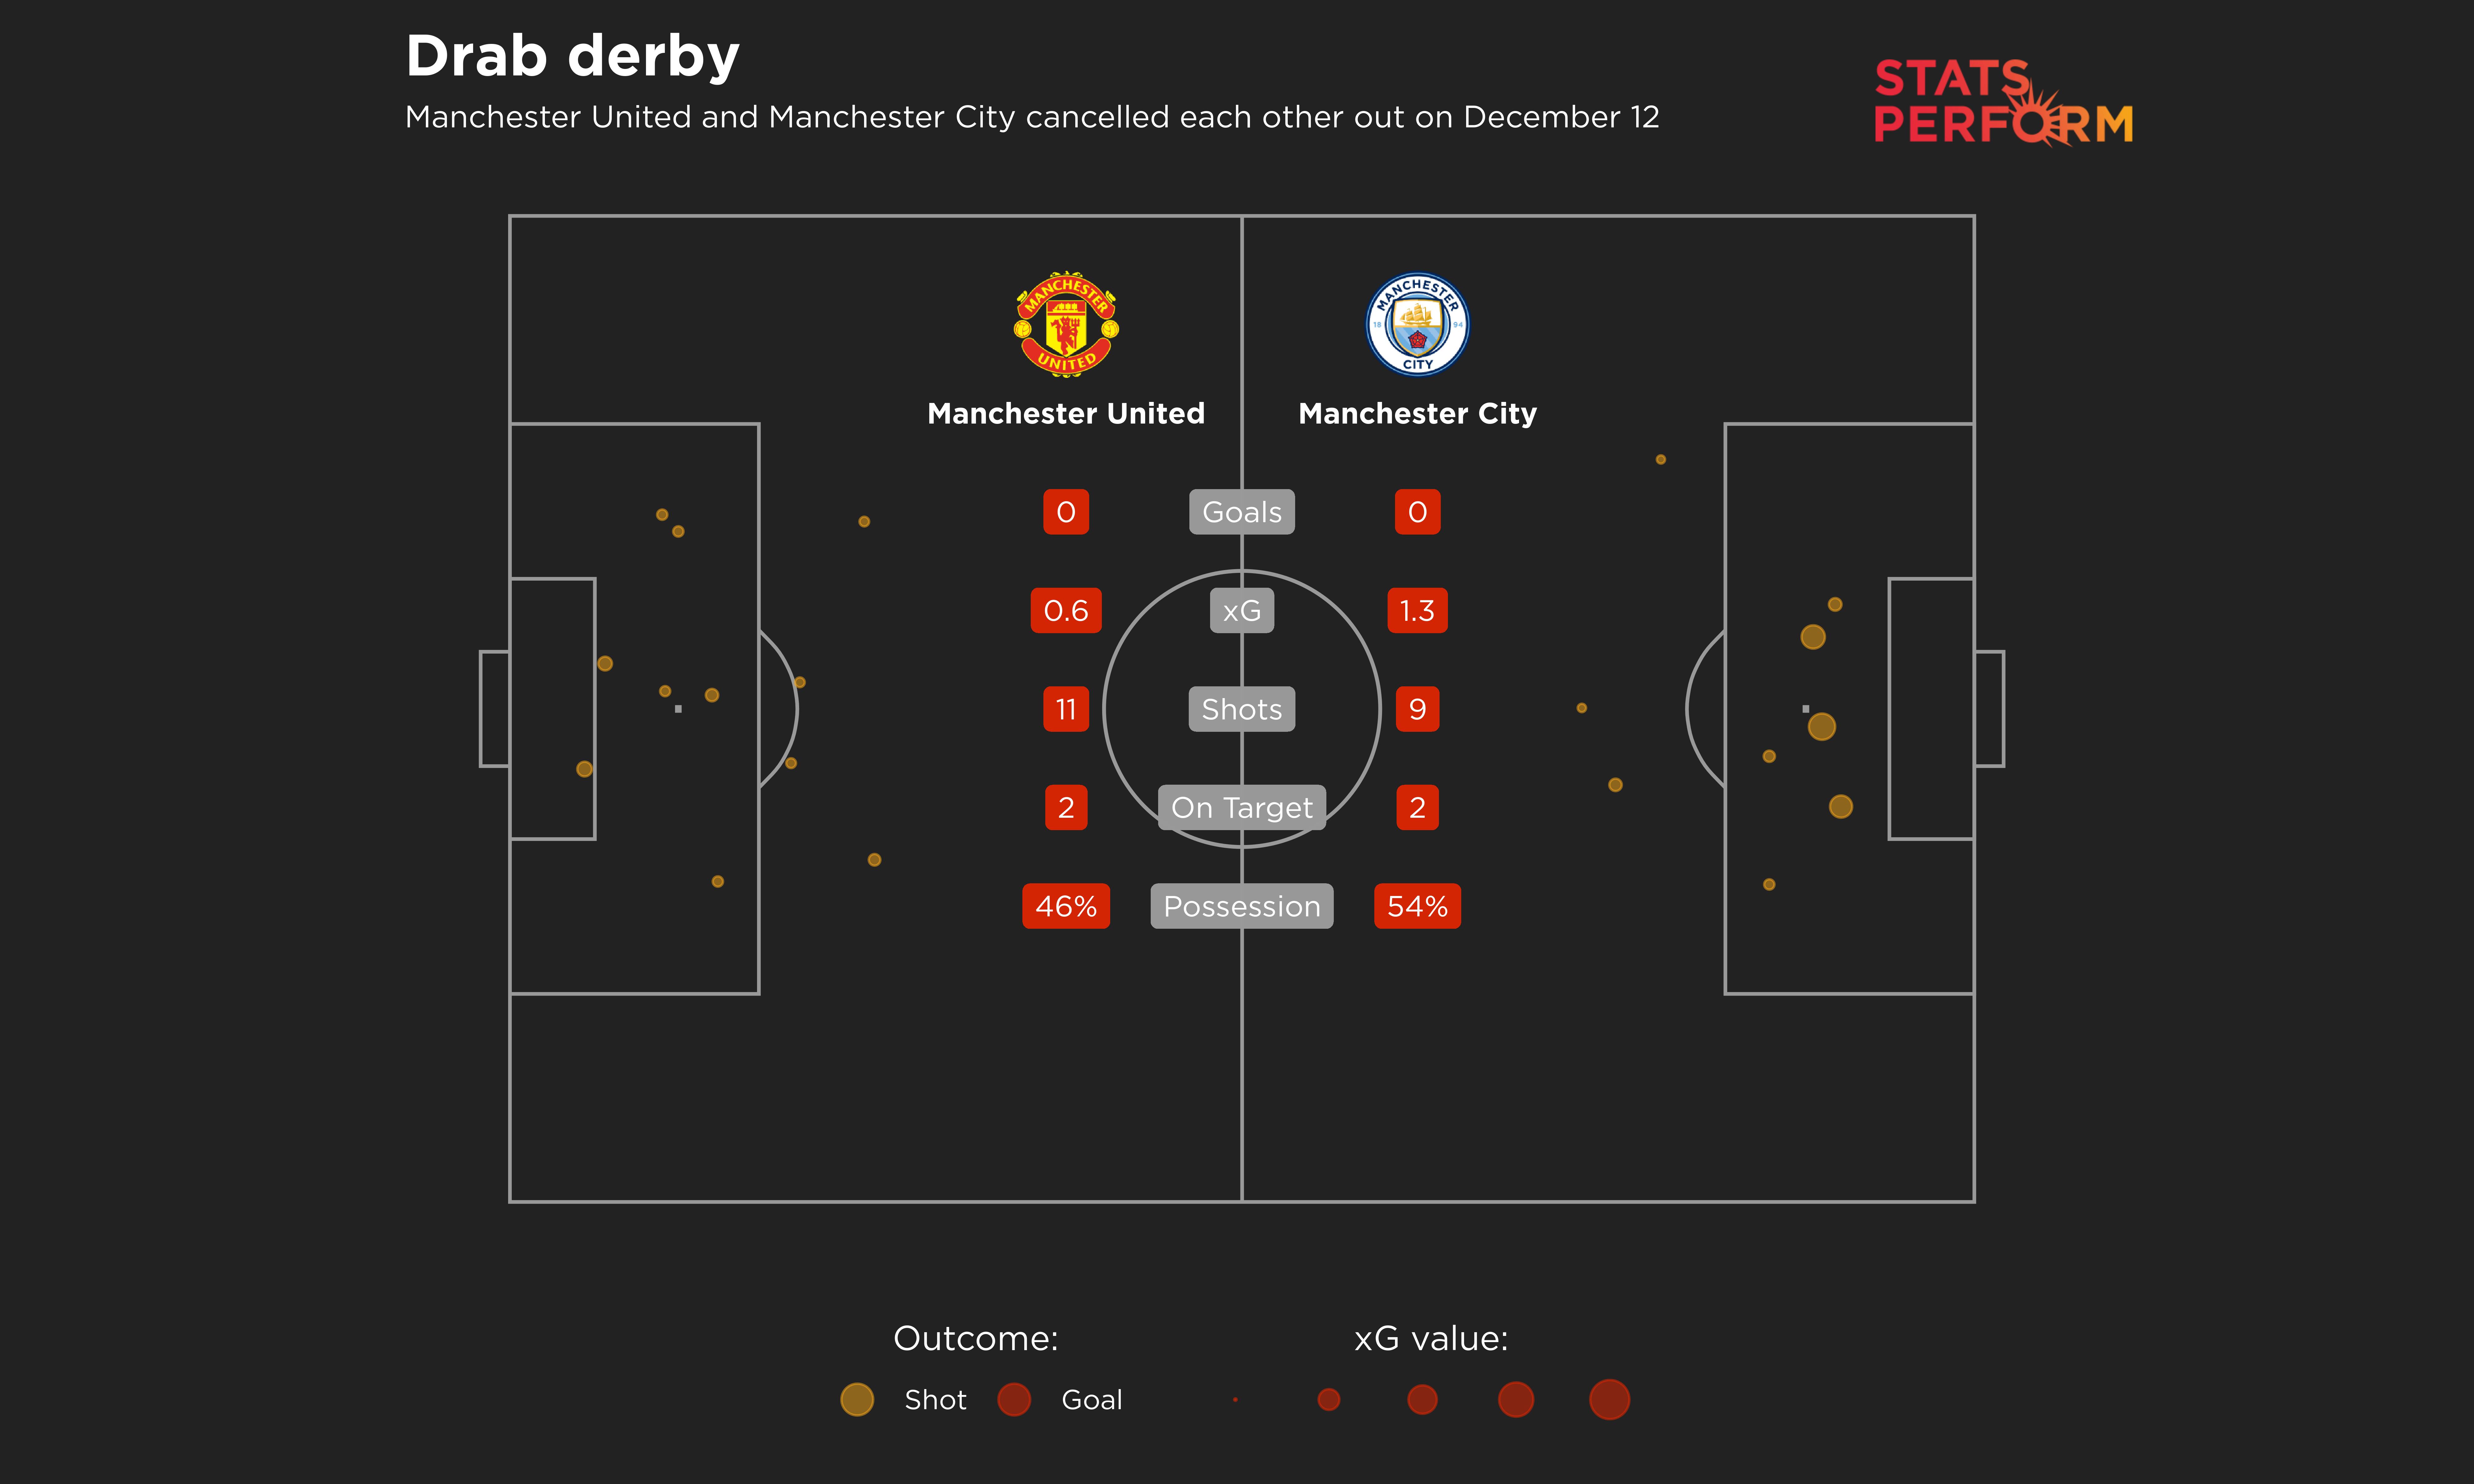 Manchester derby xG